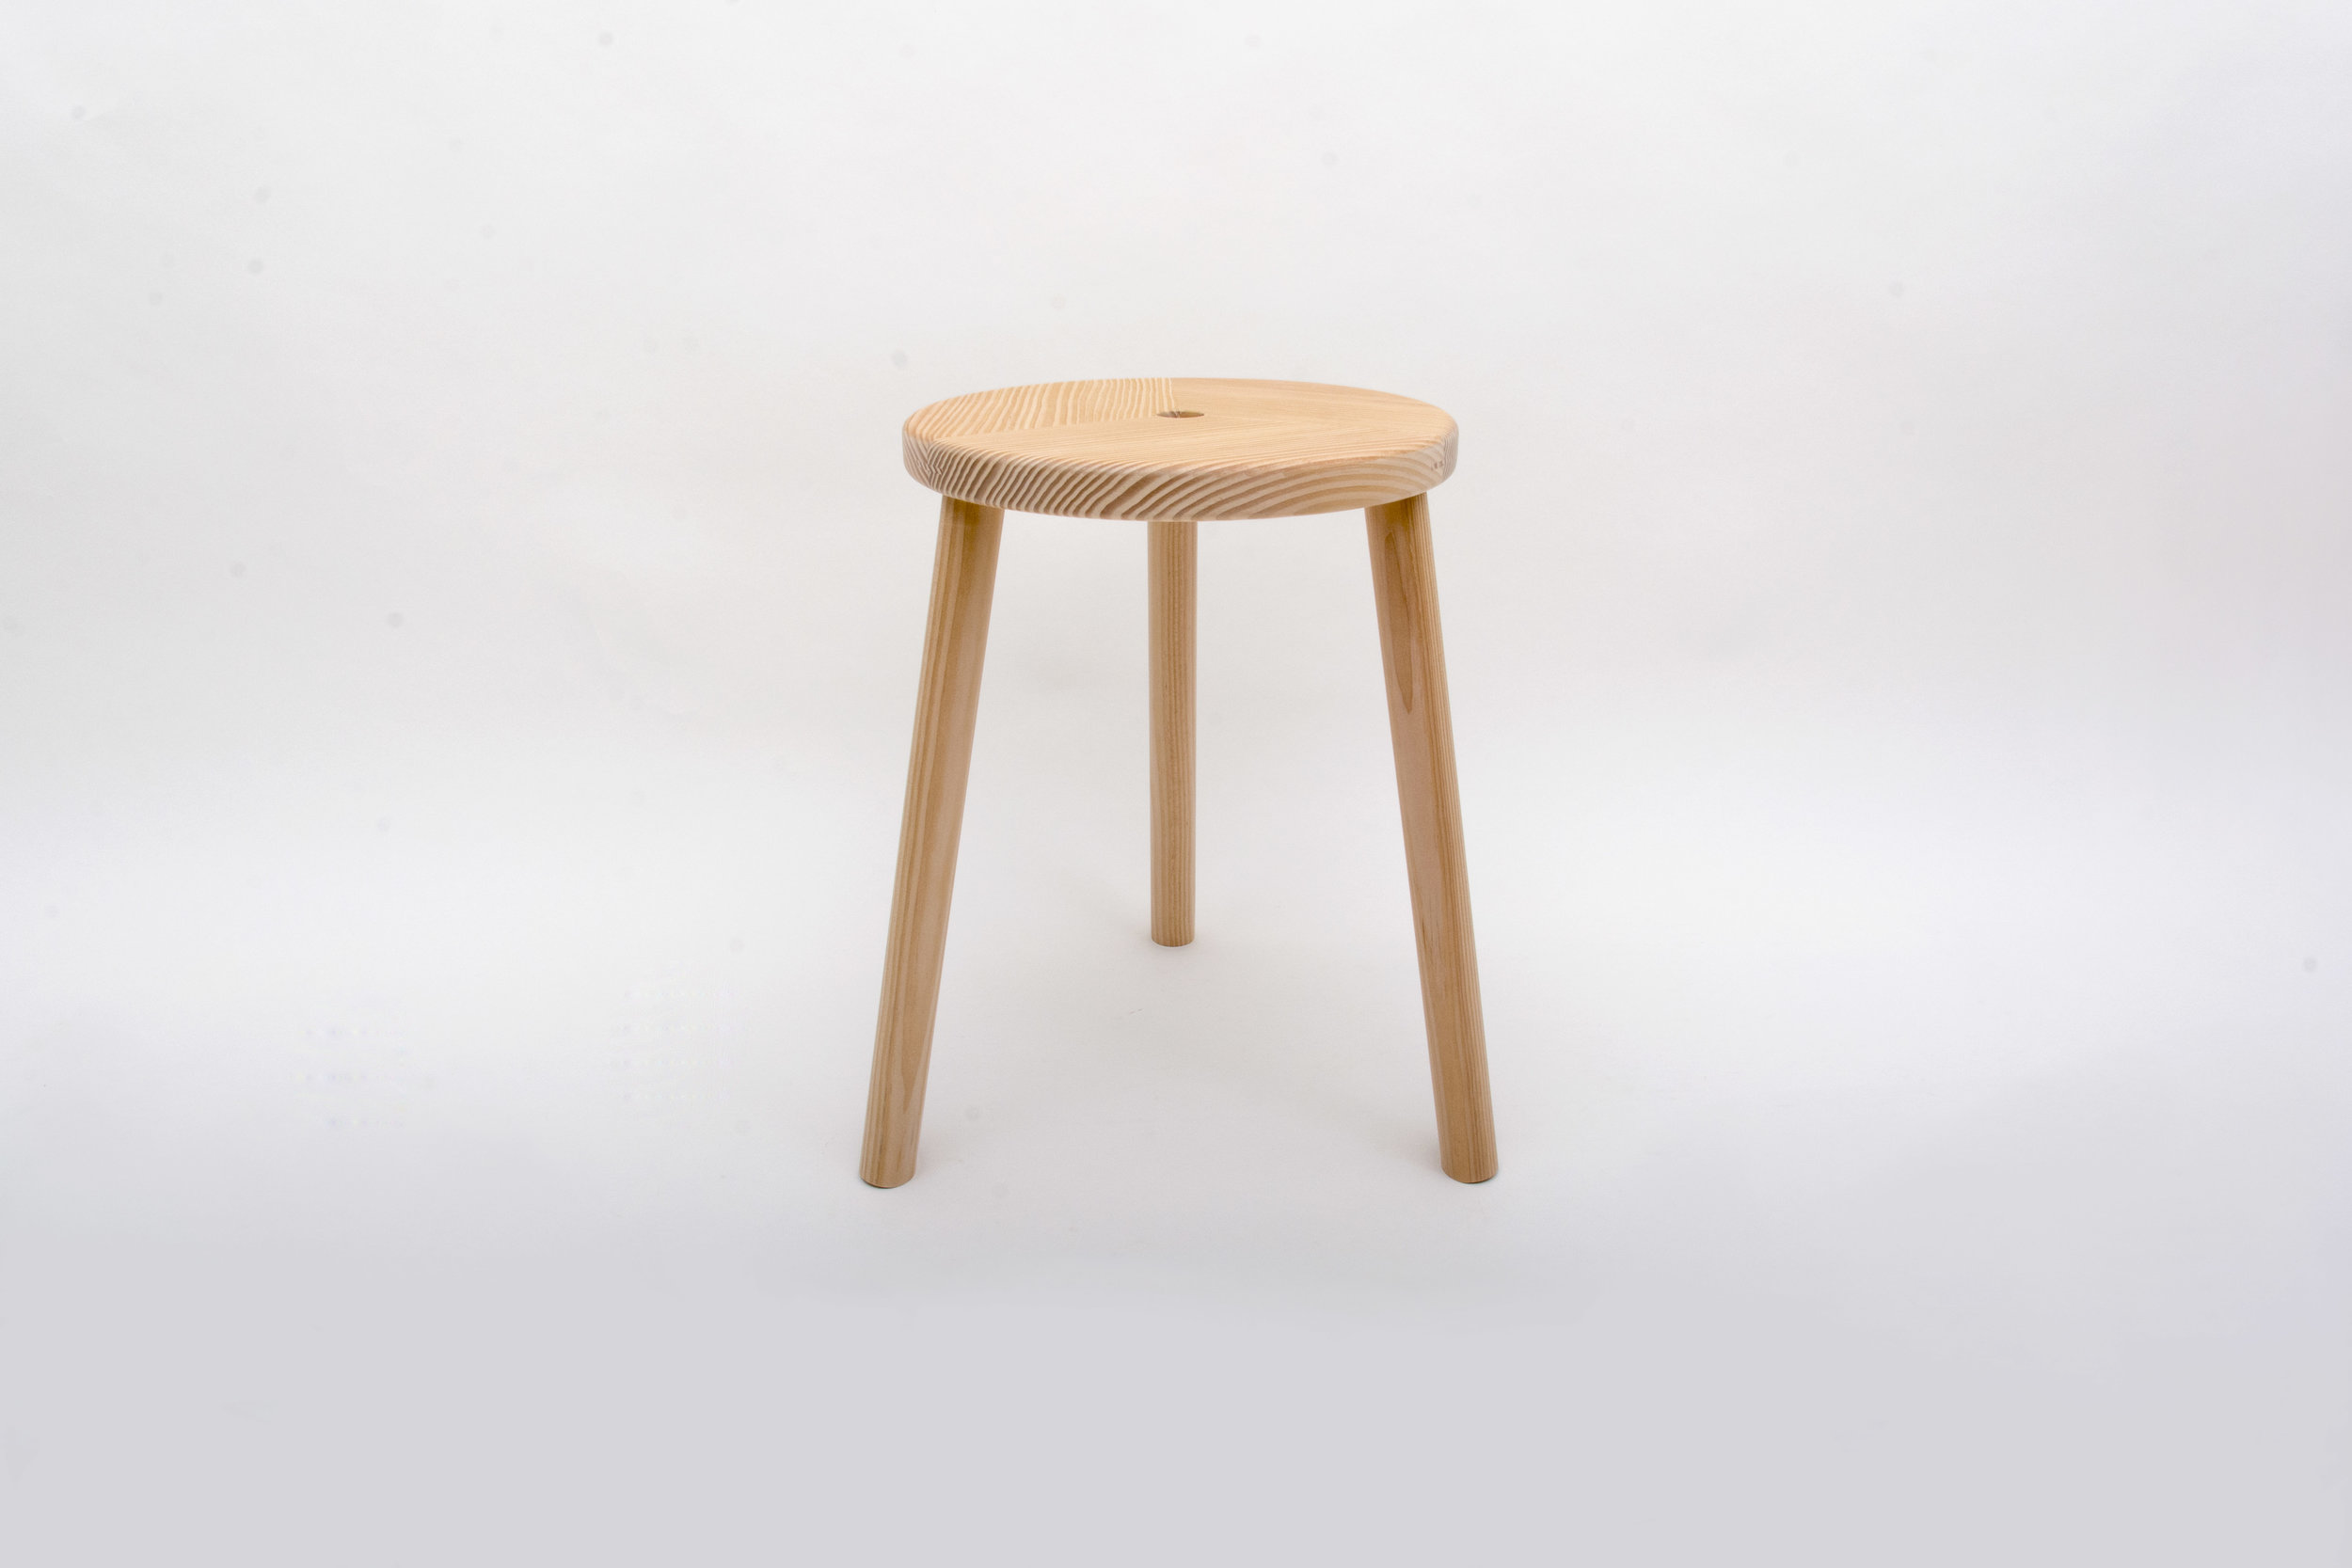 lamp stool bc edition 2.jpg